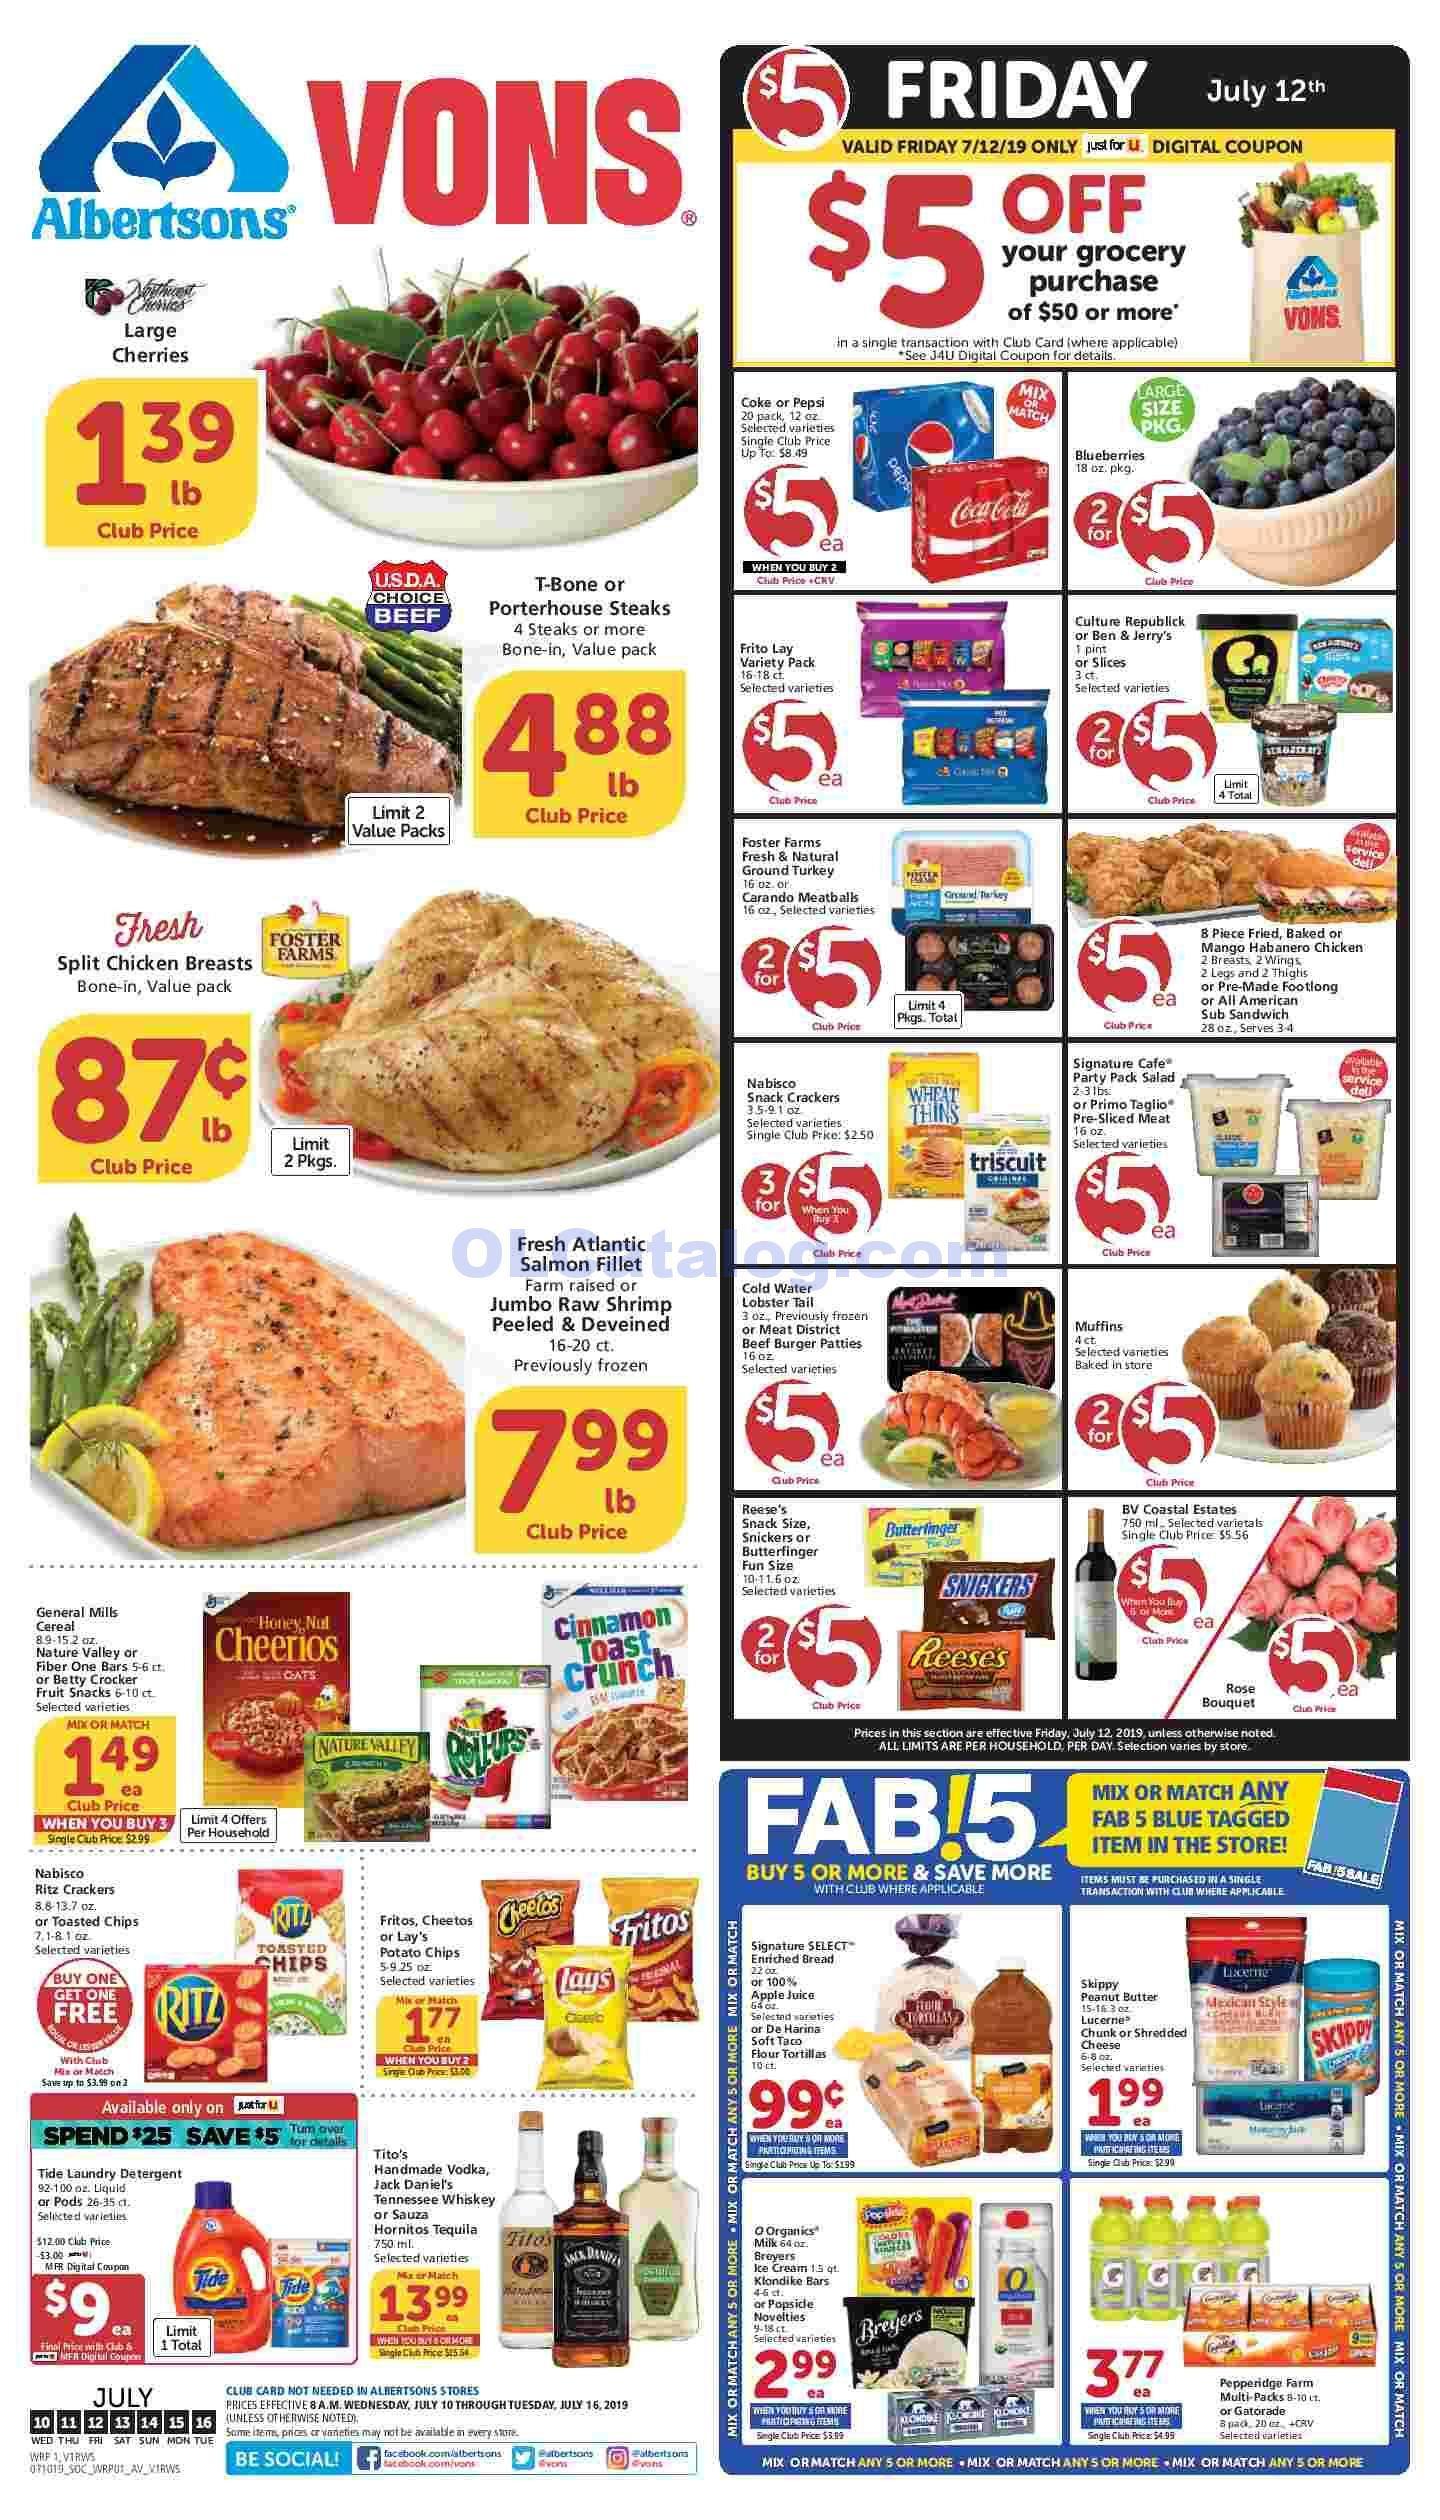 Vons 5 Dollar Friday Sale Ad March 13, 2020